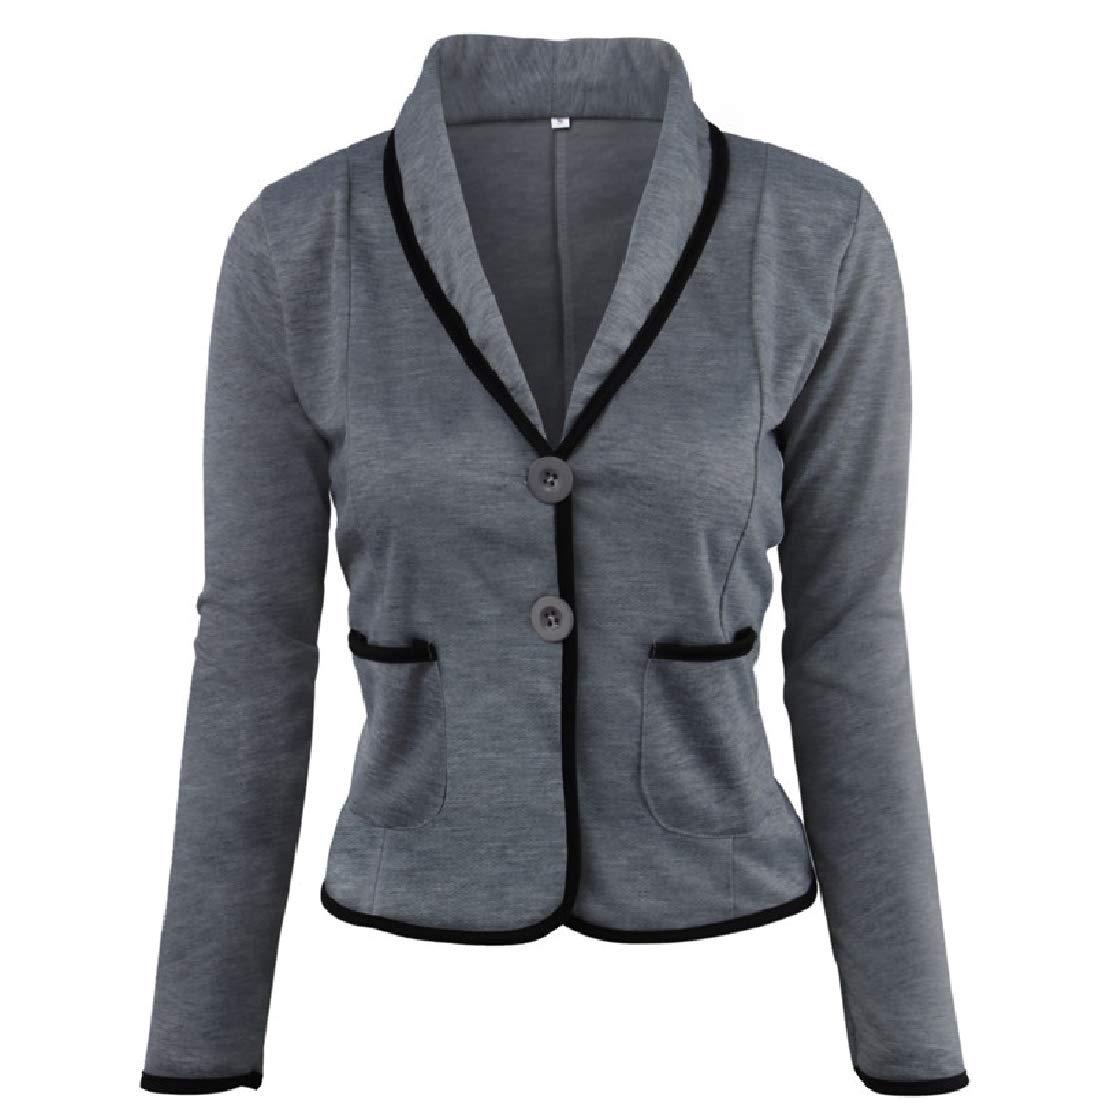 YUNY Womens 2 Button Stylish Plus-Size Slim Short Blazer Suit Coat Tops Dark Grey S